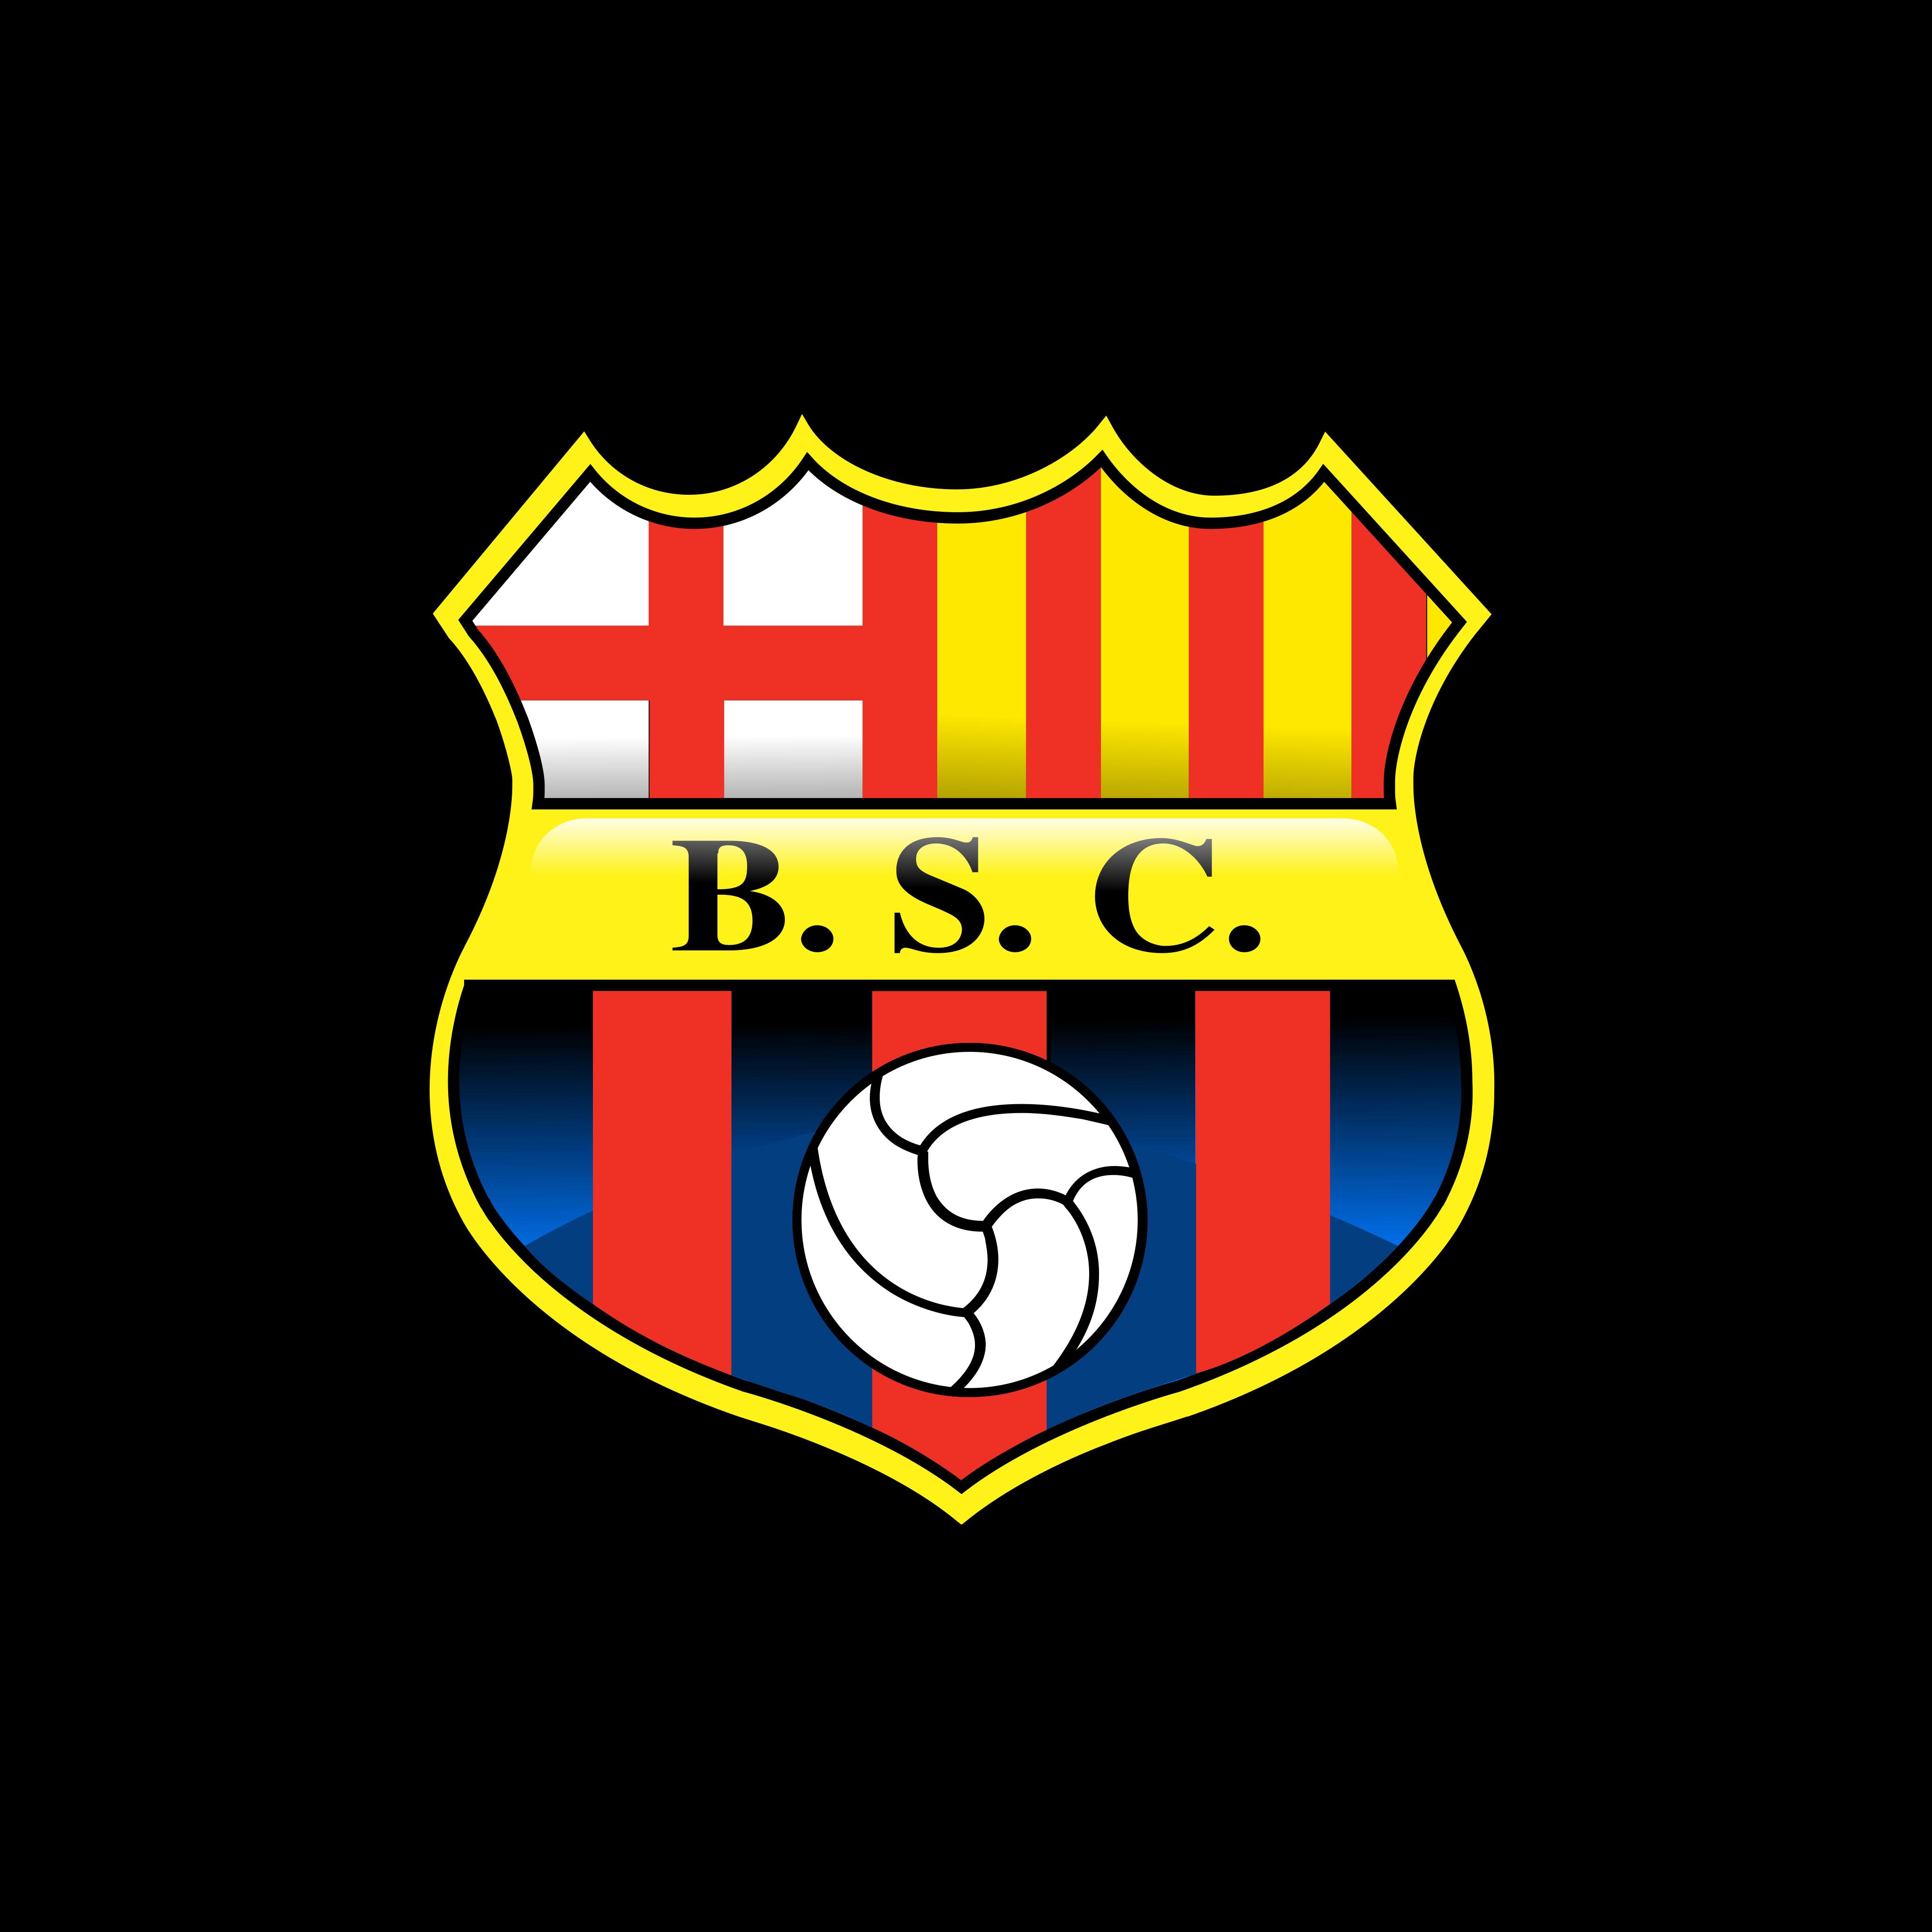 barcelona guayaquil logo 0 - Barcelona SC Guayaquil Logo